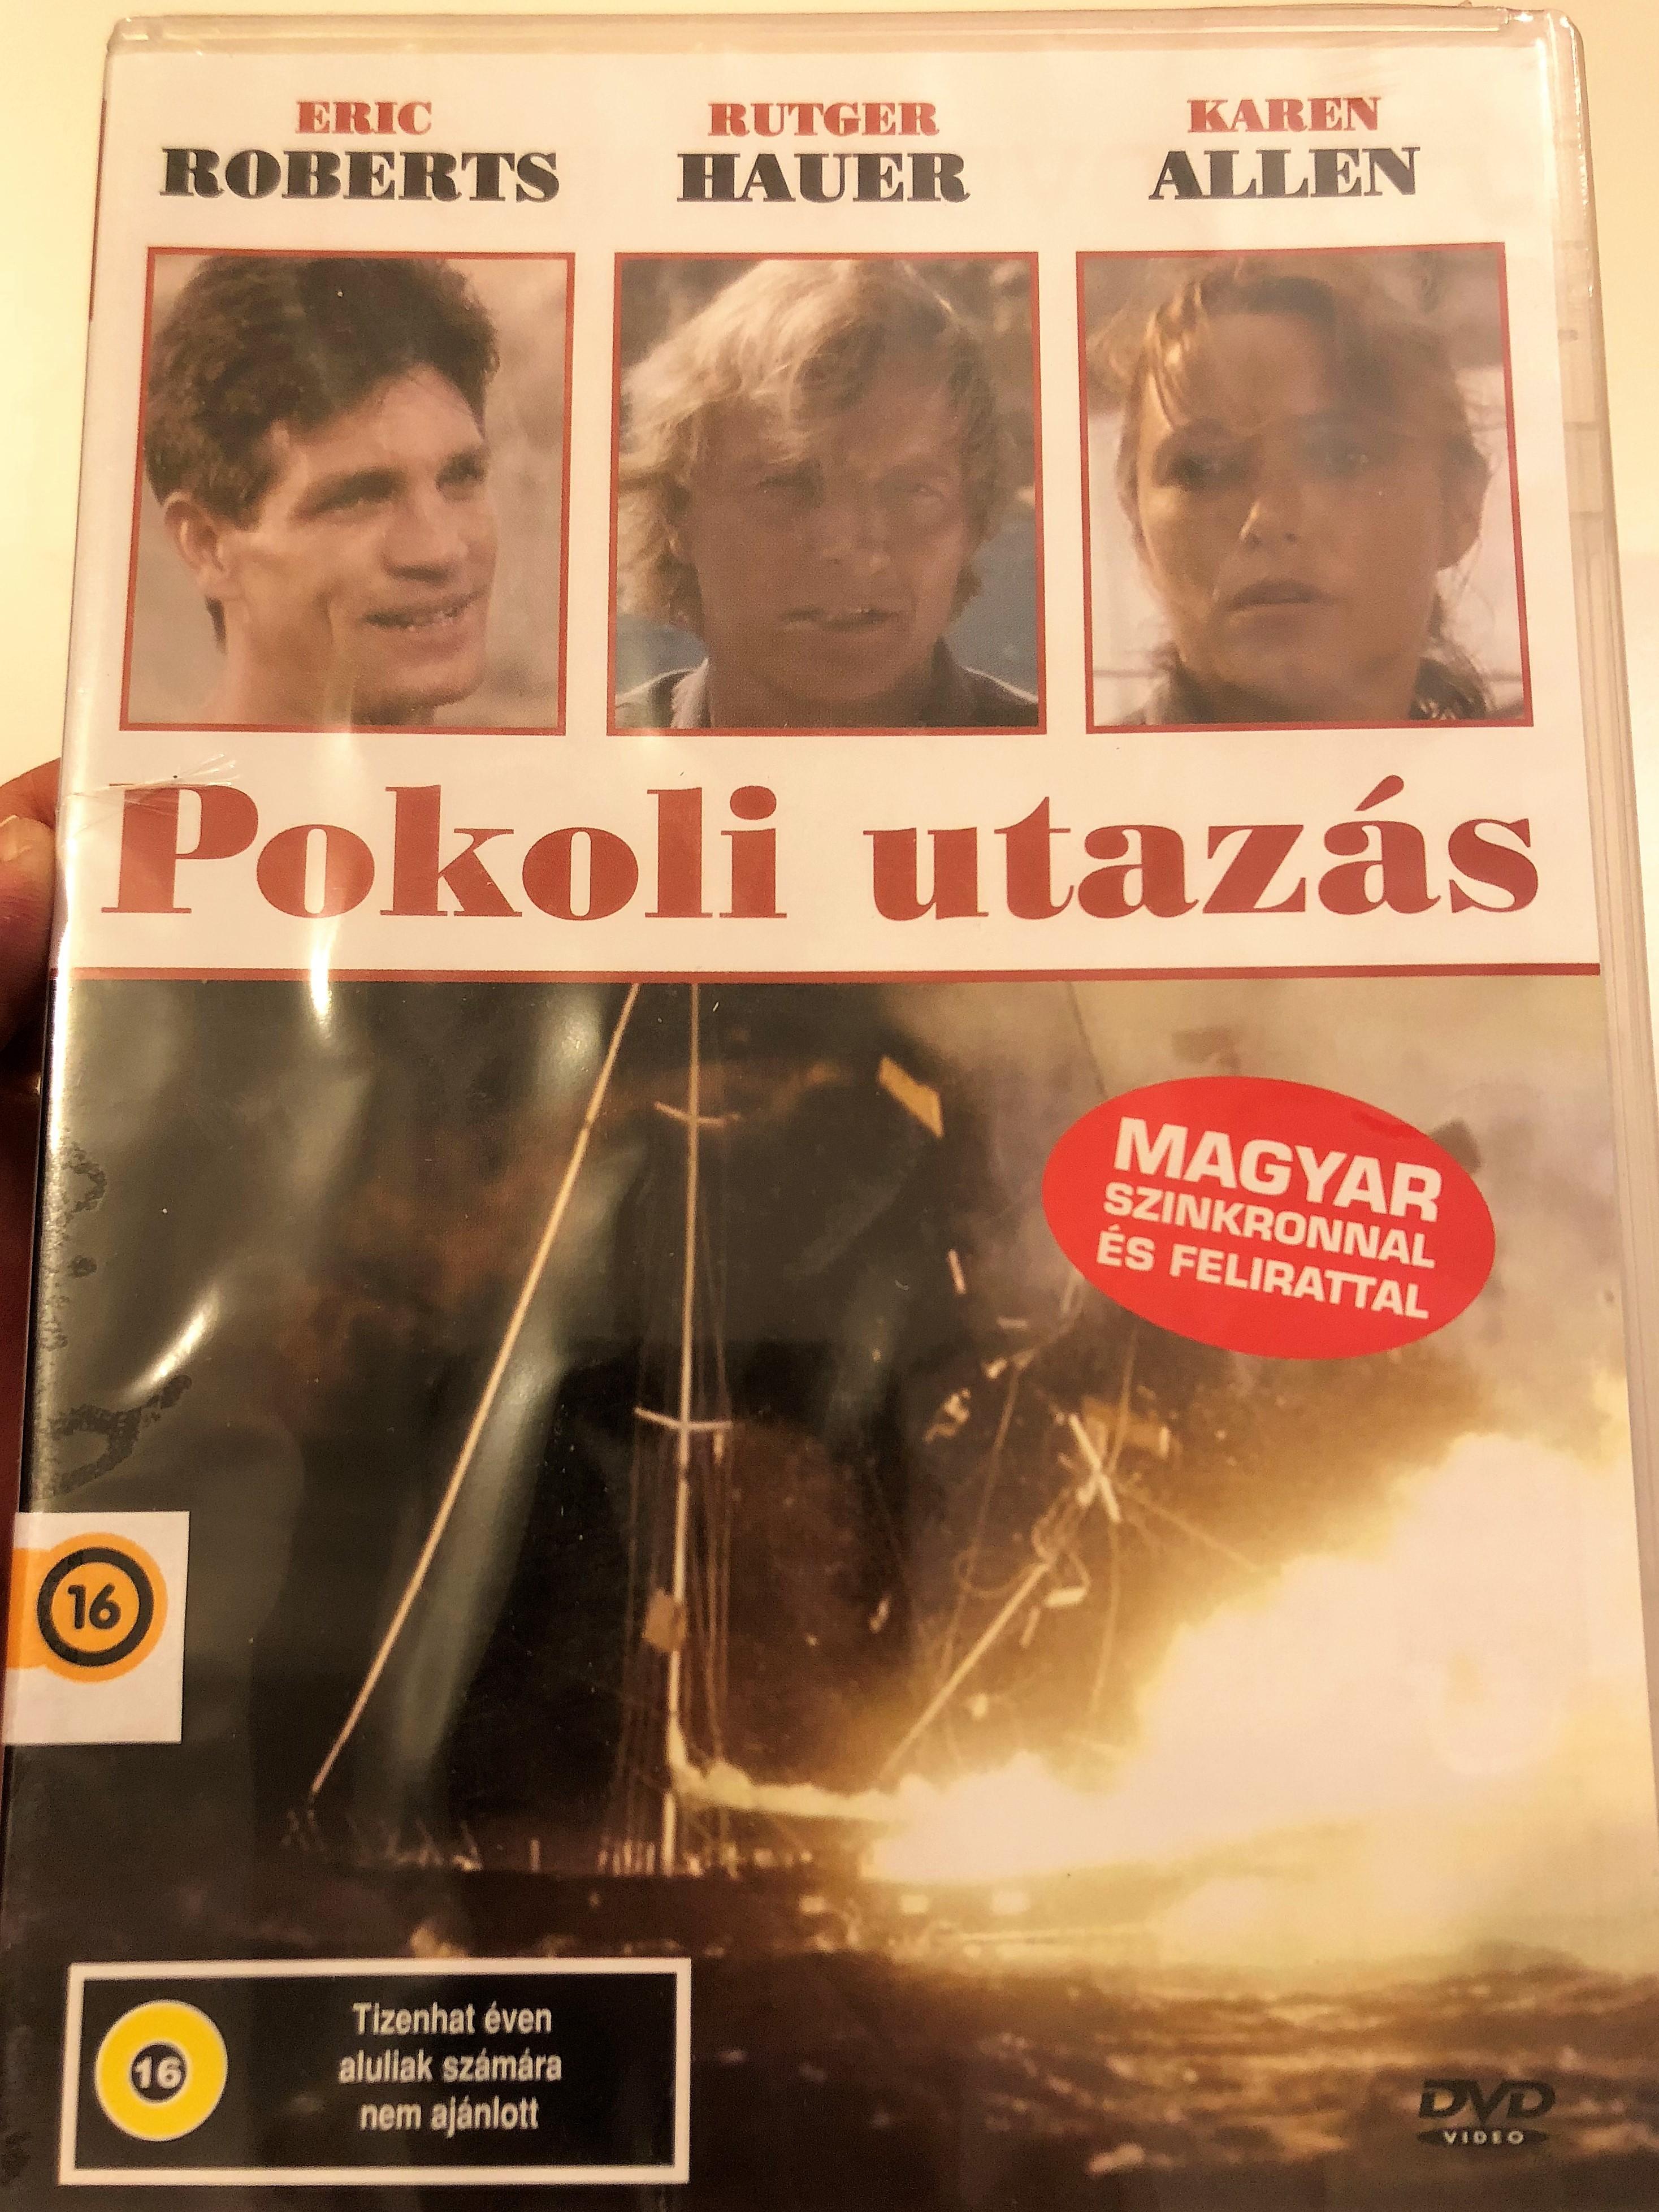 voyage-dvd-1993-pokoli-utaz-s-directed-by-john-mackenzie-starring-rutger-hauer-eric-roberts-karen-allen-1-.jpg